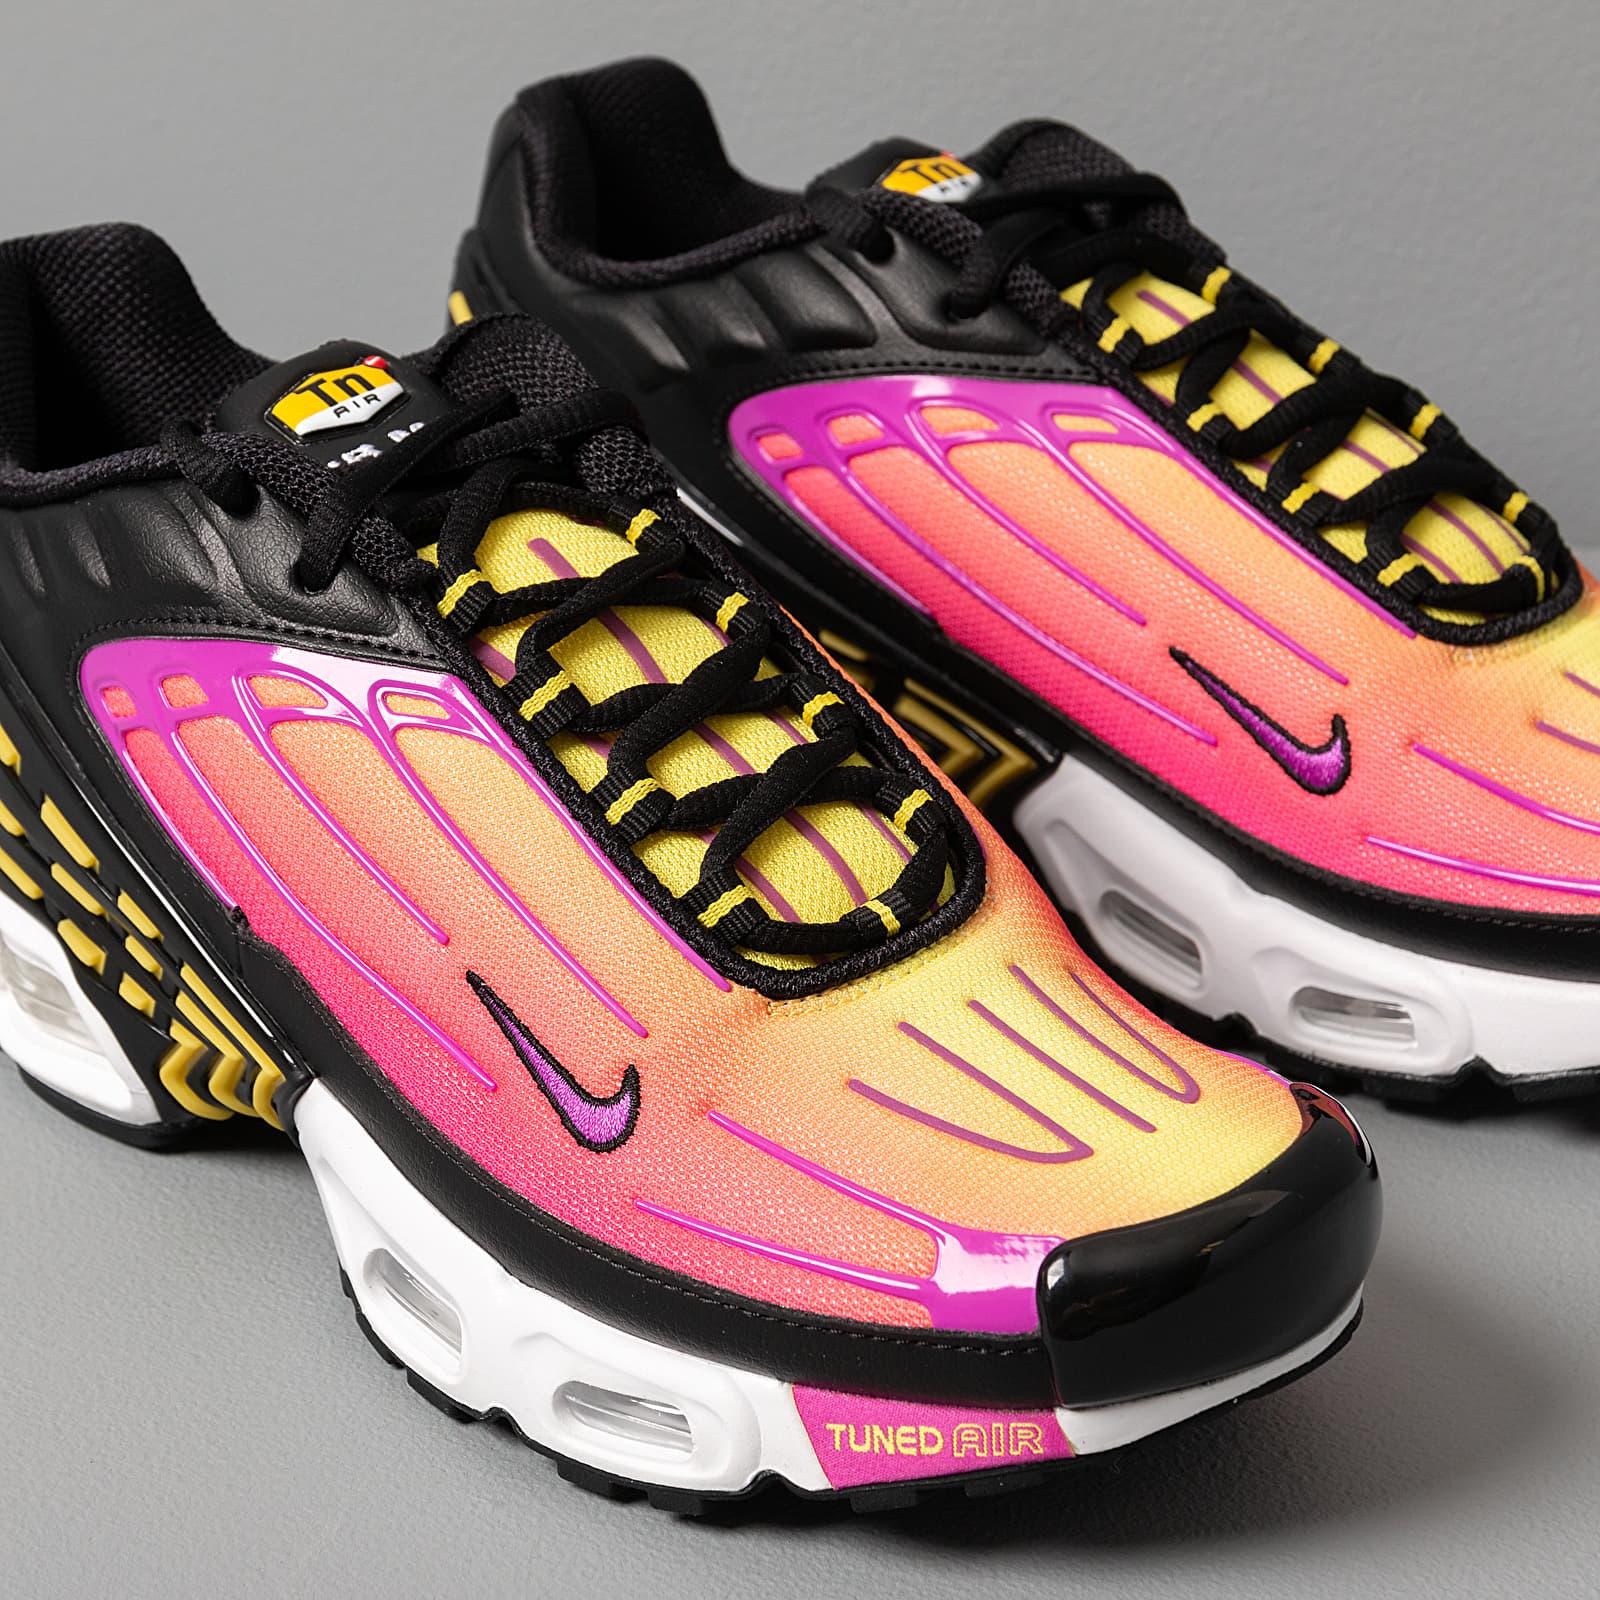 Chaussures et baskets homme Nike Air Max Plus III Black/ Hyper ...